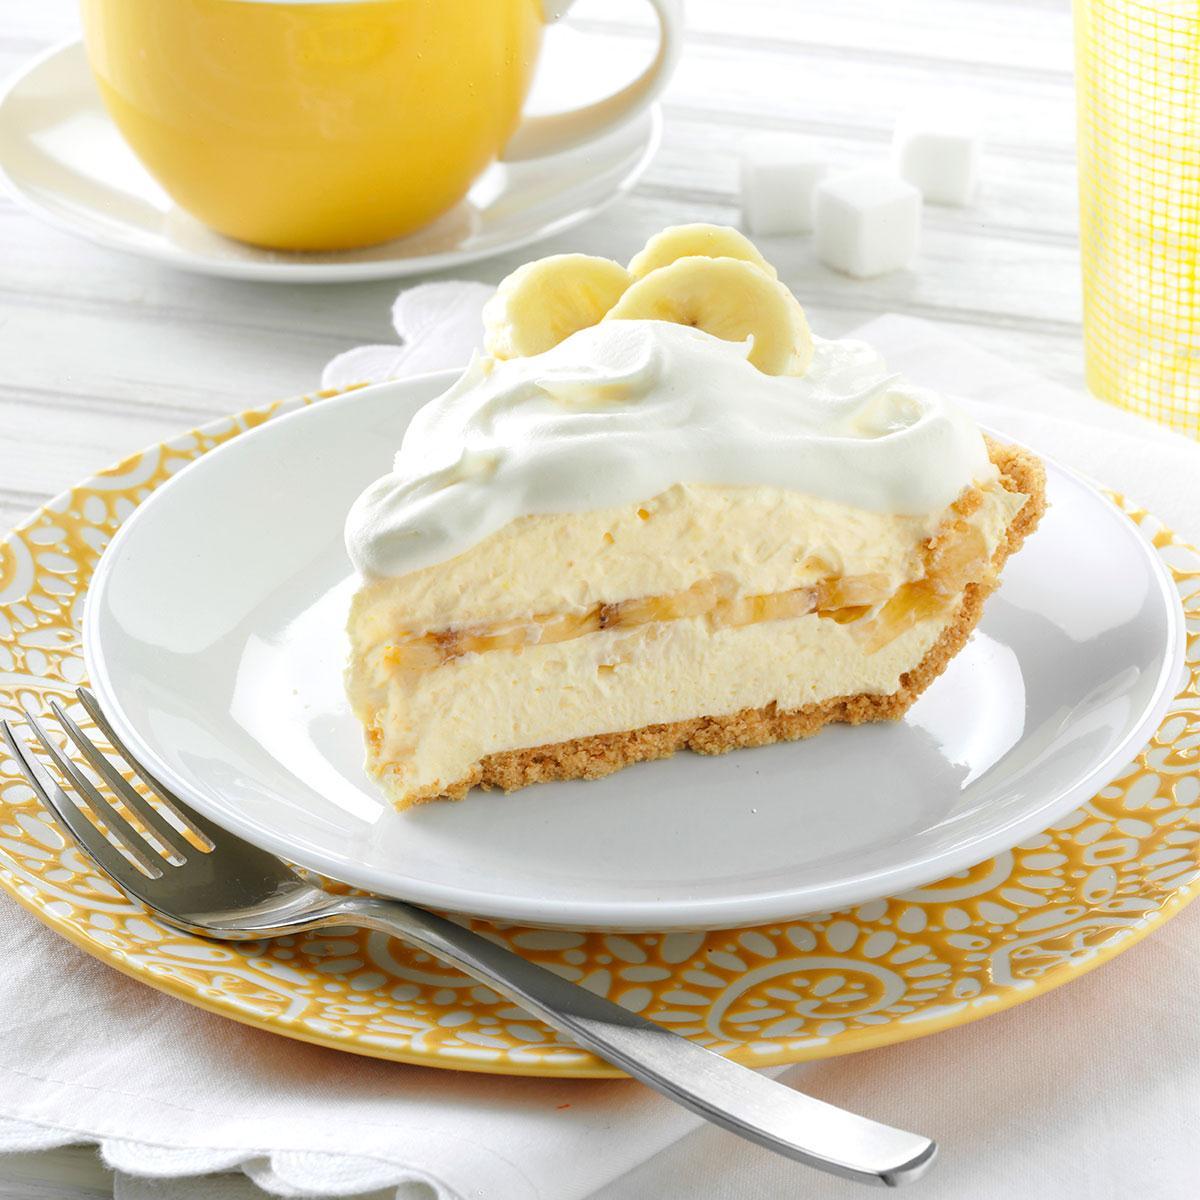 Image result for banana cream pie recipe